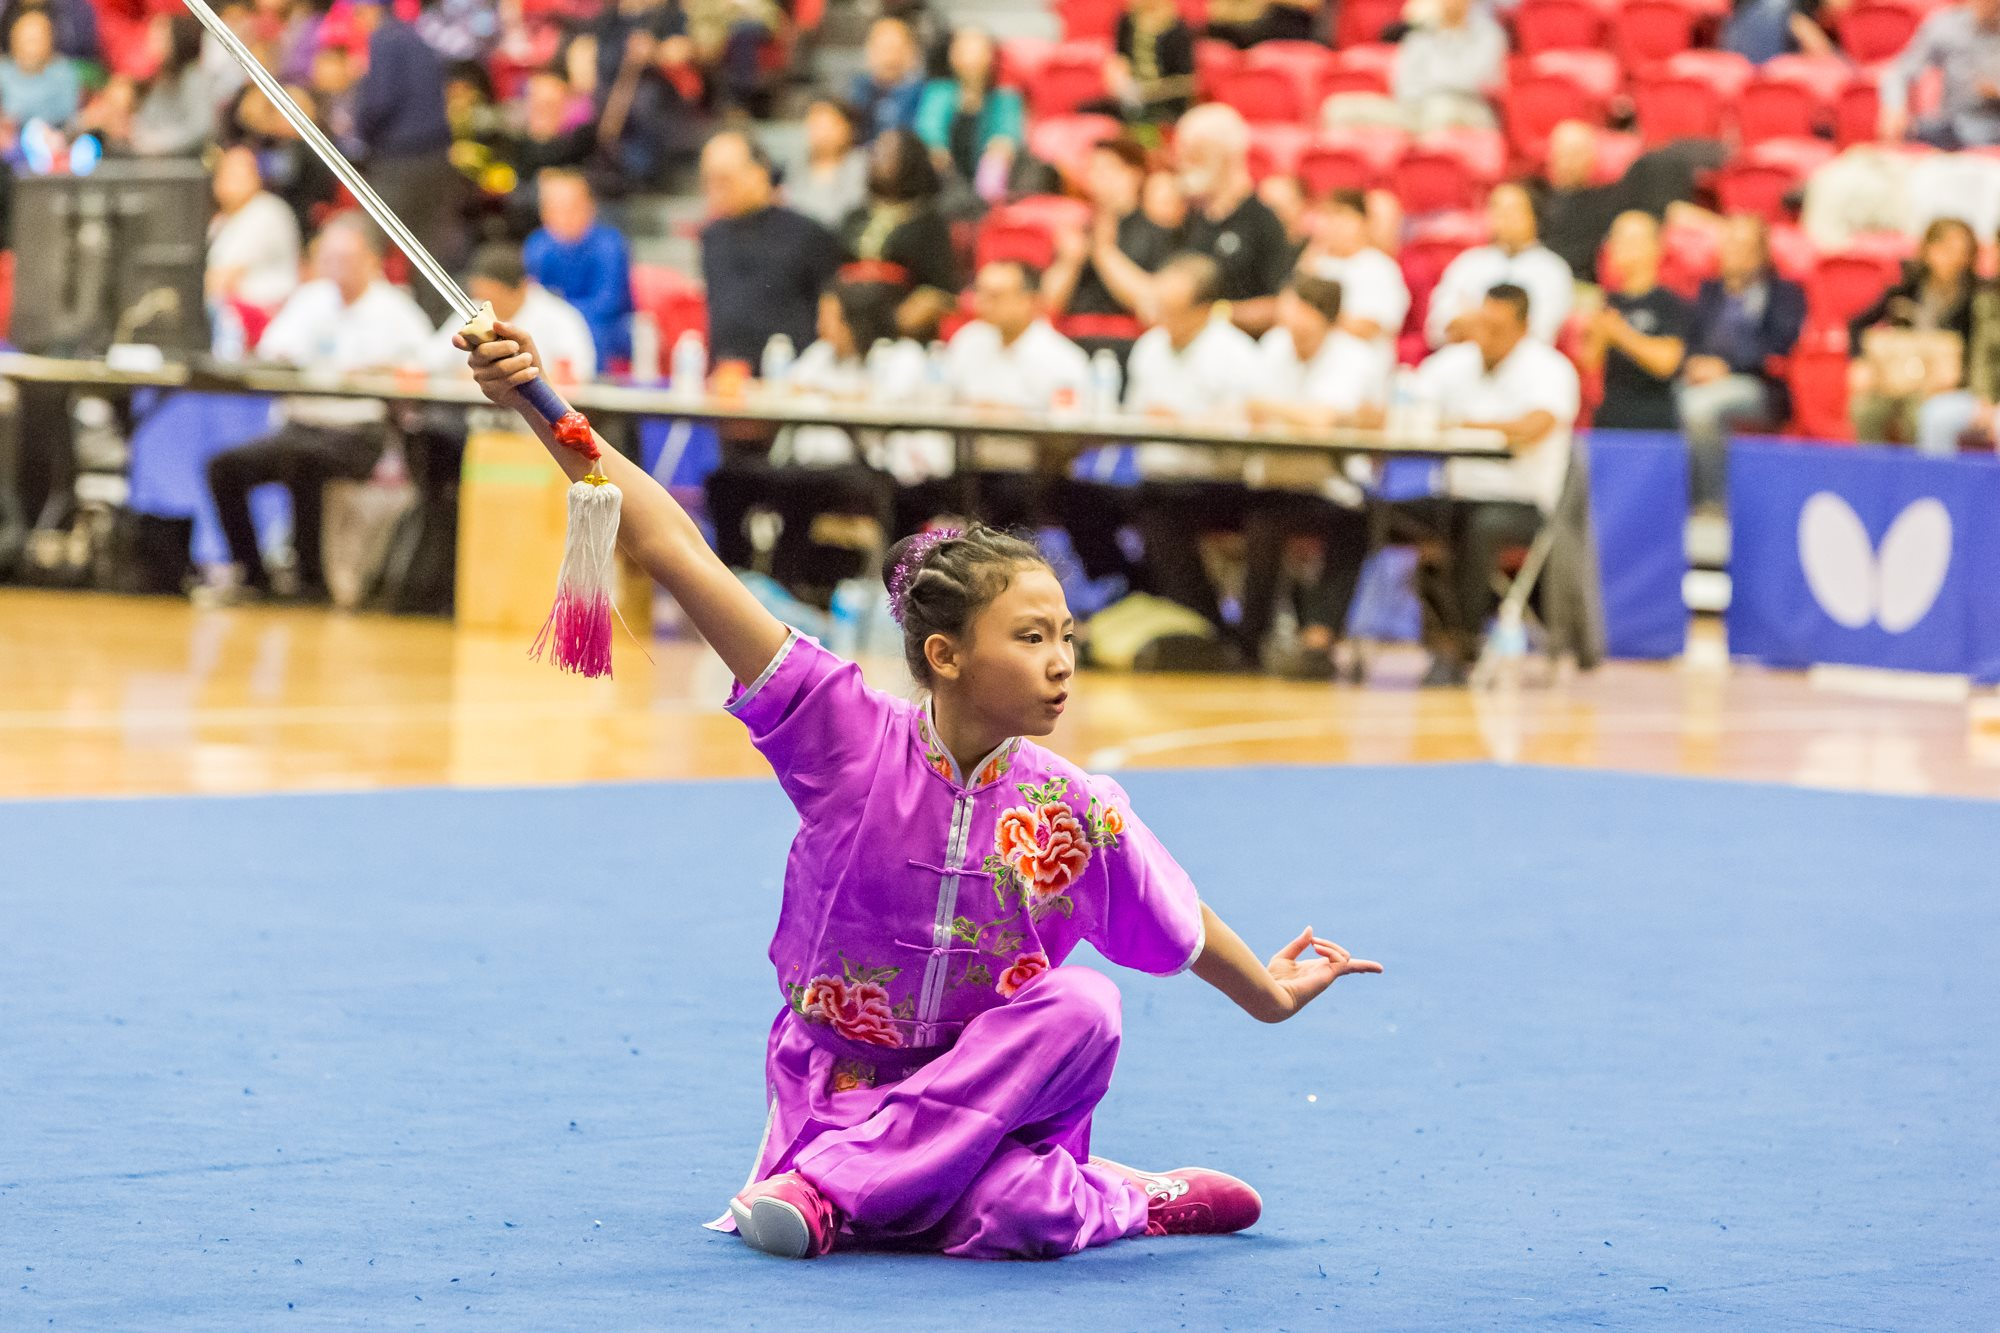 wayland-li-wushu-toronto-markham-canadian-wushu-championships-2017-jianshu-2.jpg